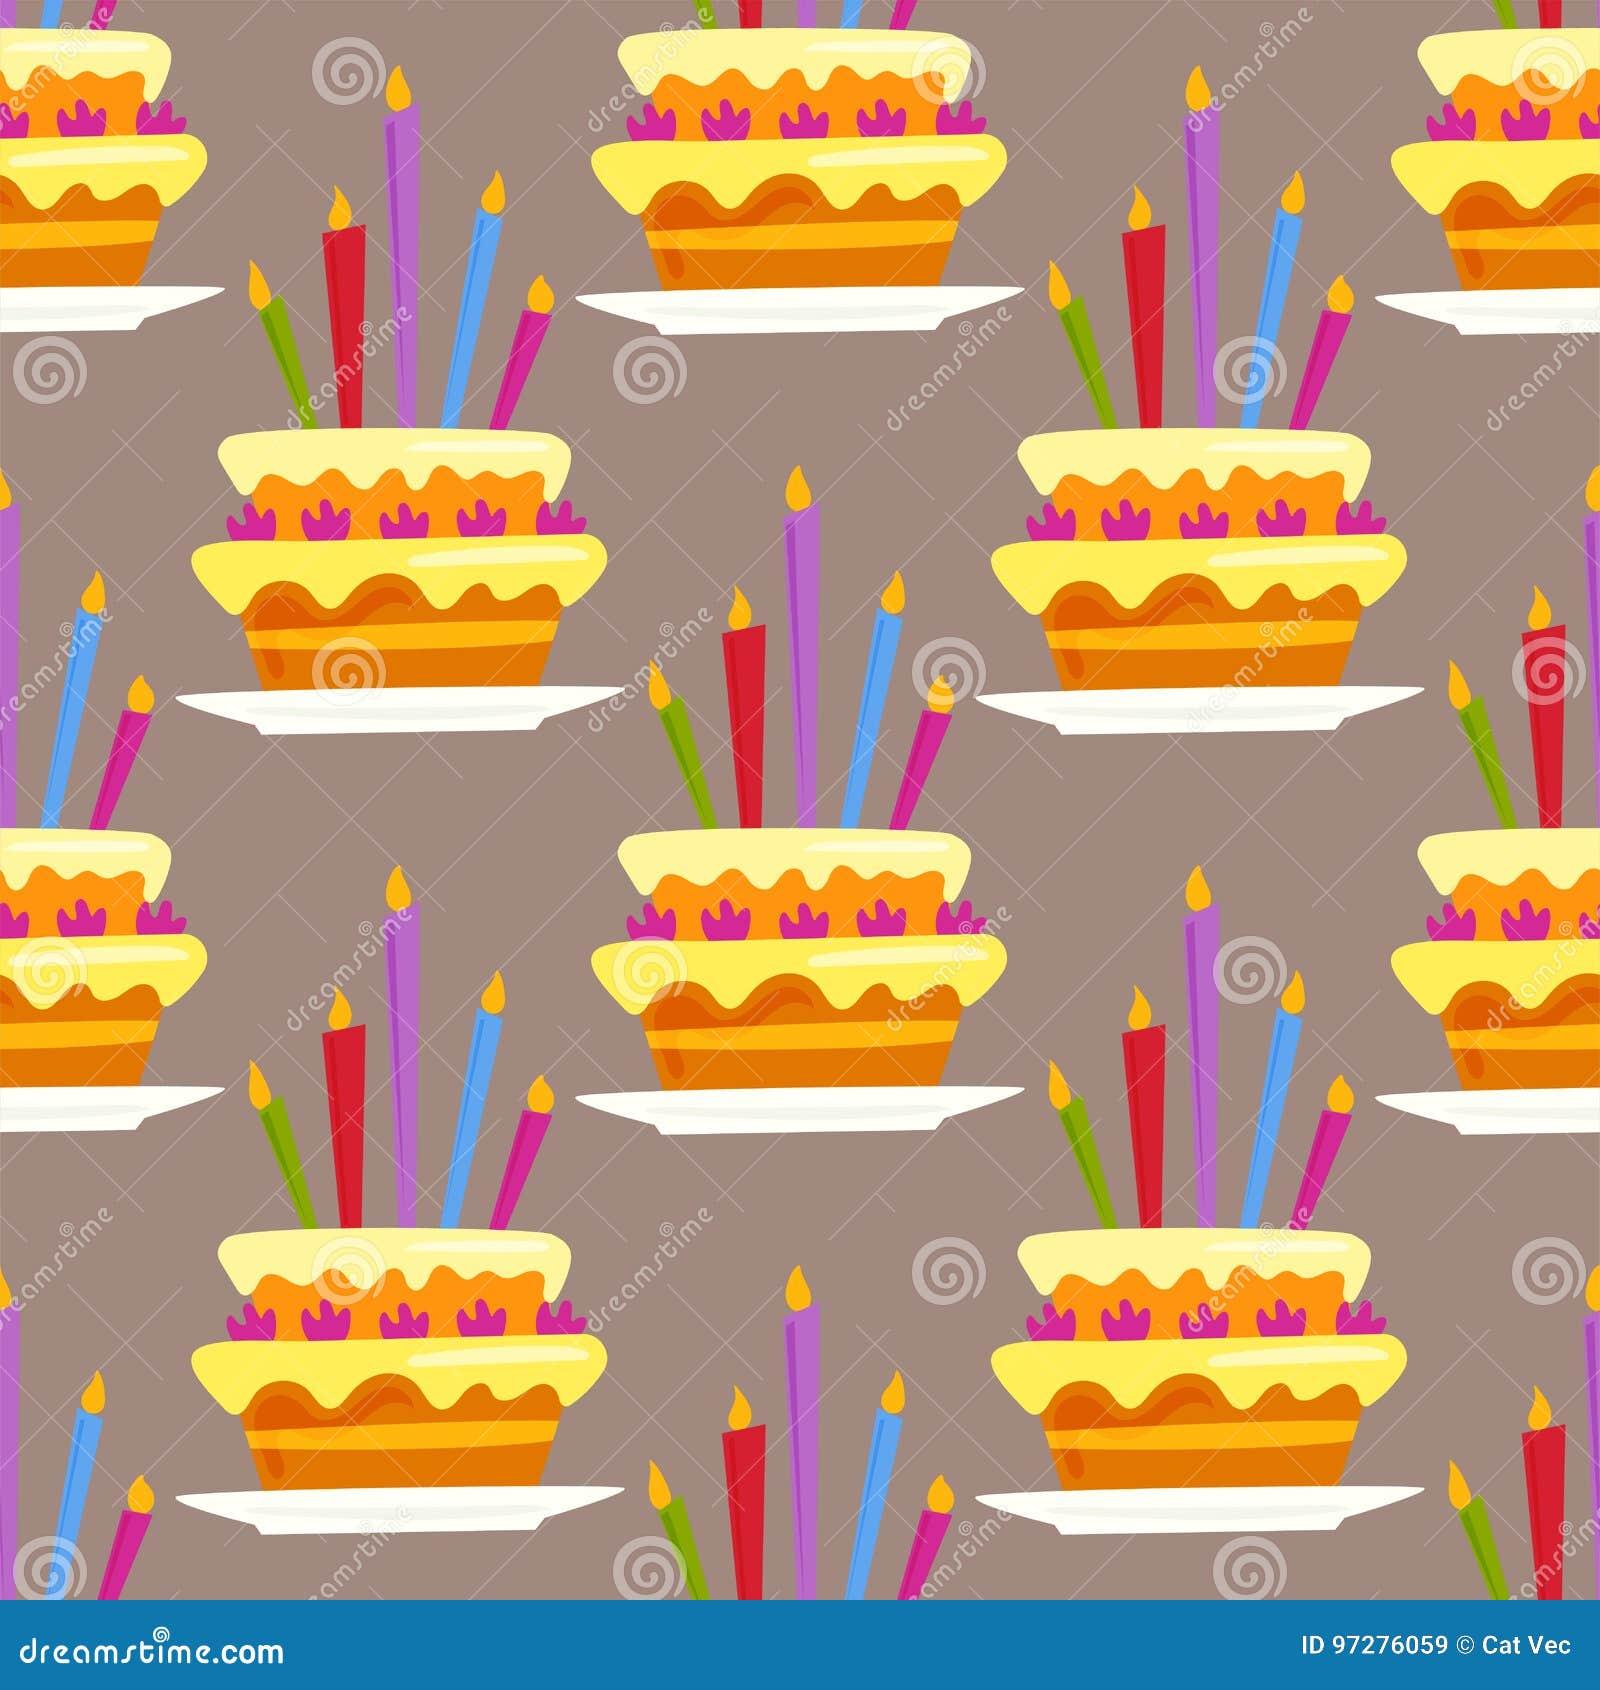 Party Cake Celebration Happy Birthday Surprise Decoration Seamless